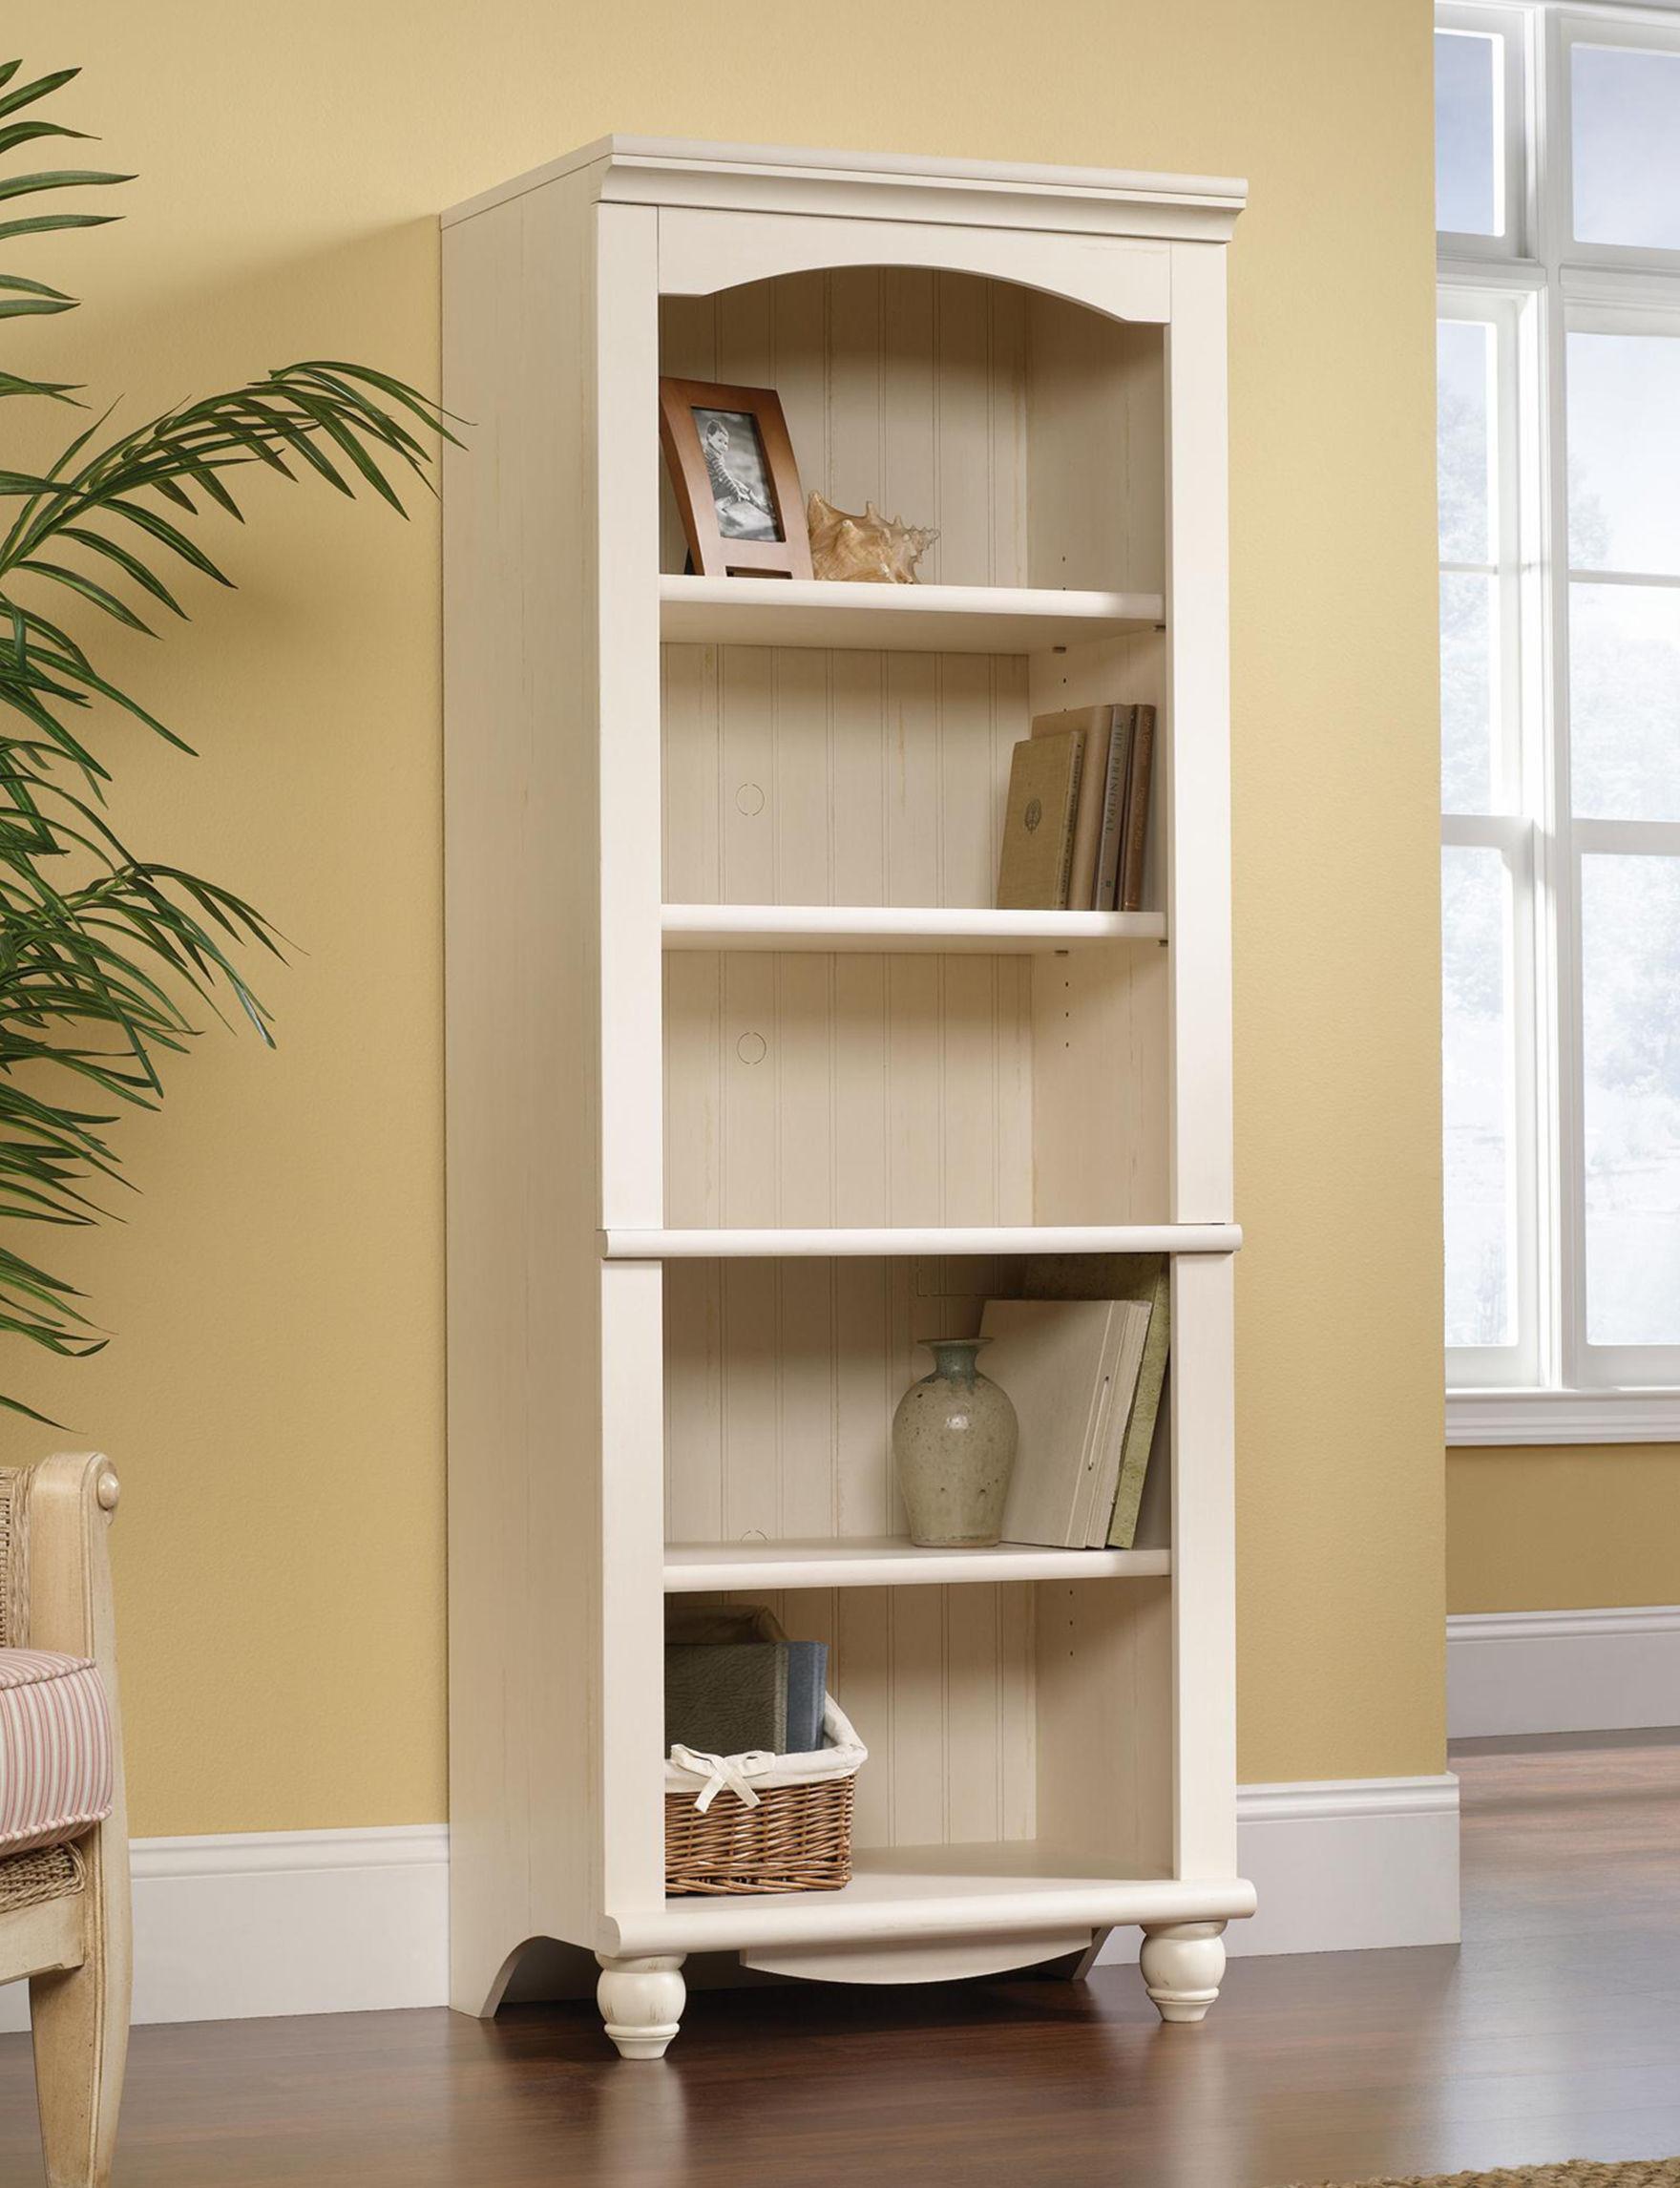 Sauder White Bookcases & Shelves Bedroom Furniture Entryway Furniture Home Office Furniture Living Room Furniture